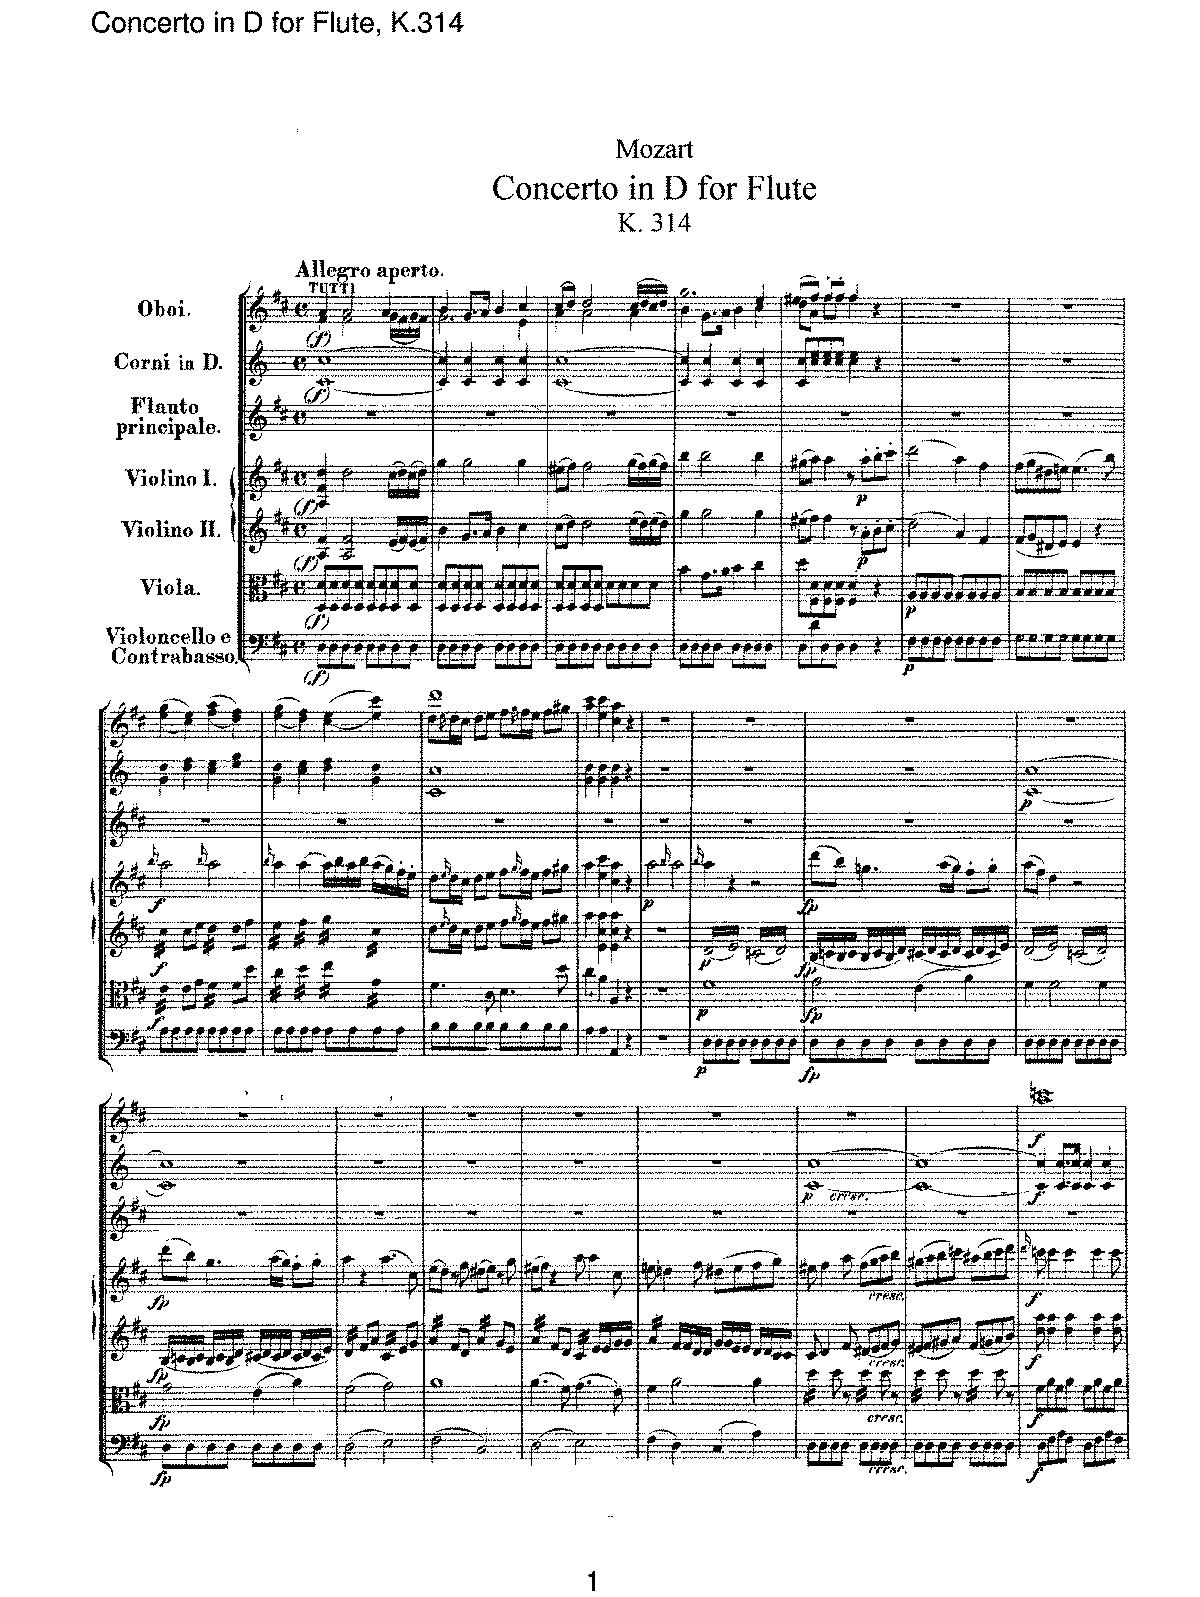 Mozart clarinet concerto 2nd movement